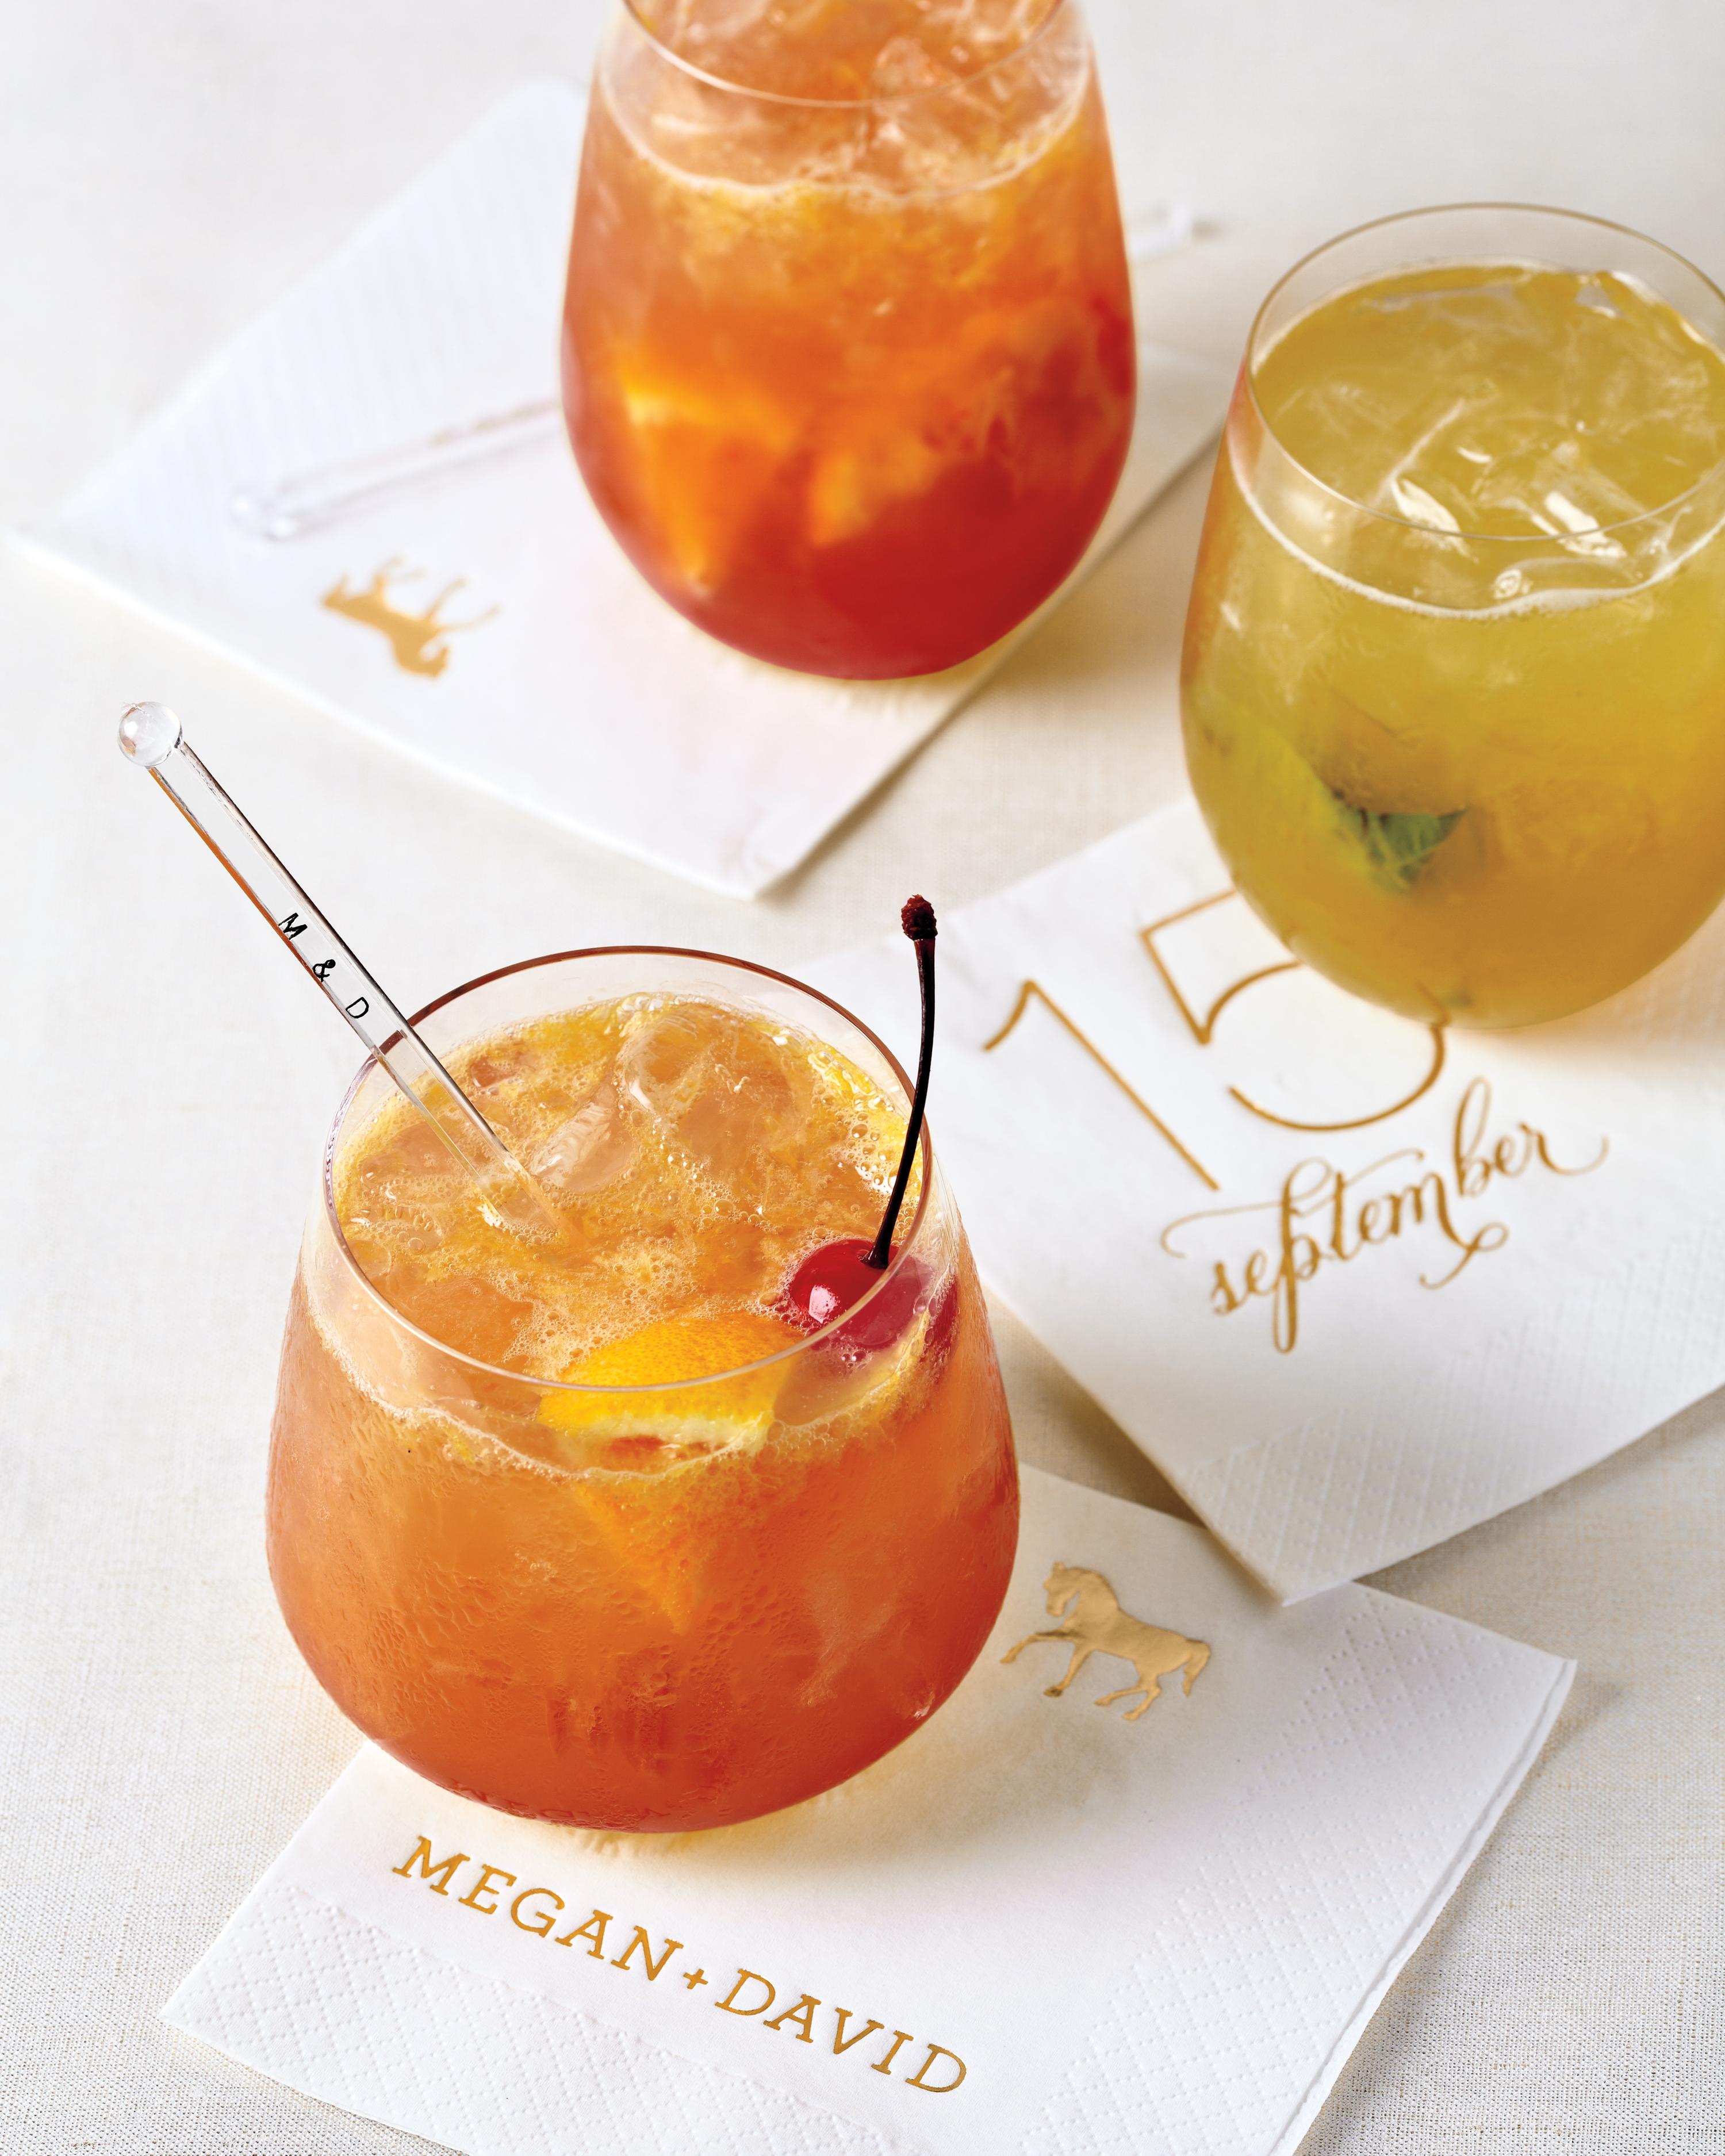 megan-david-cocktails-mwd109358.jpg